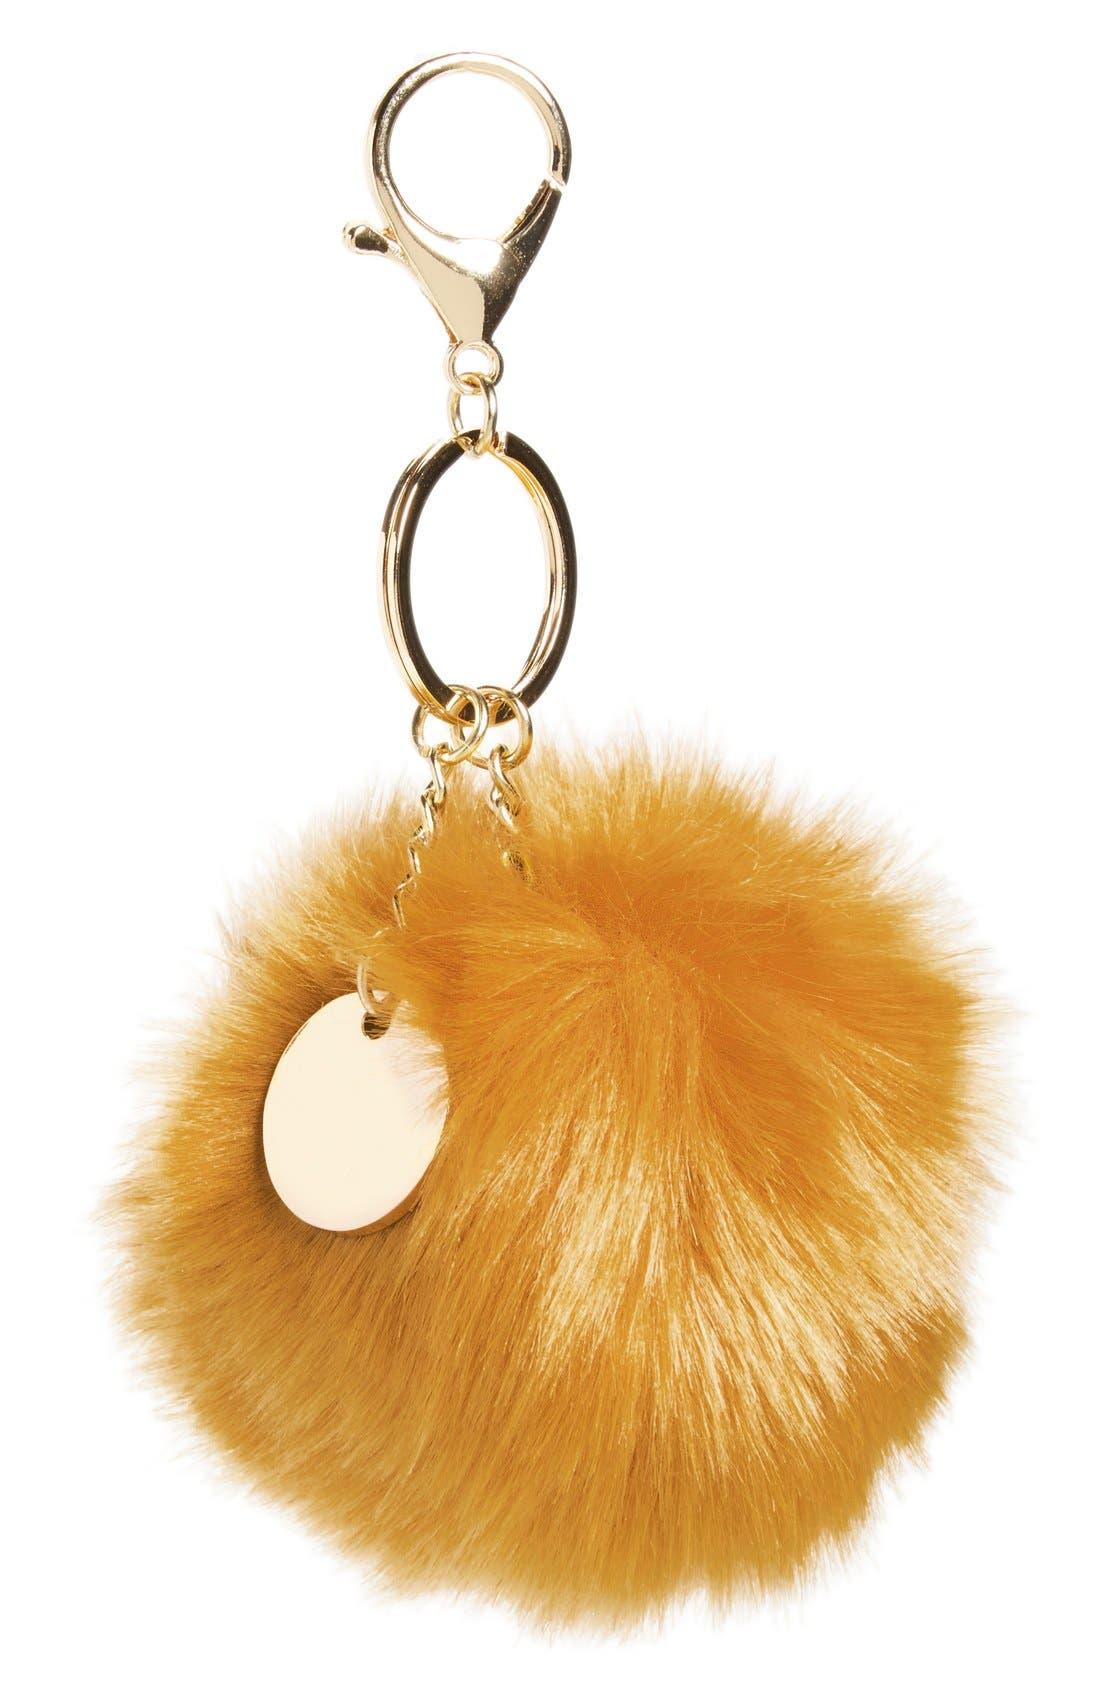 Main Image - Topshop Faux Fur Fluffy Bag Charm